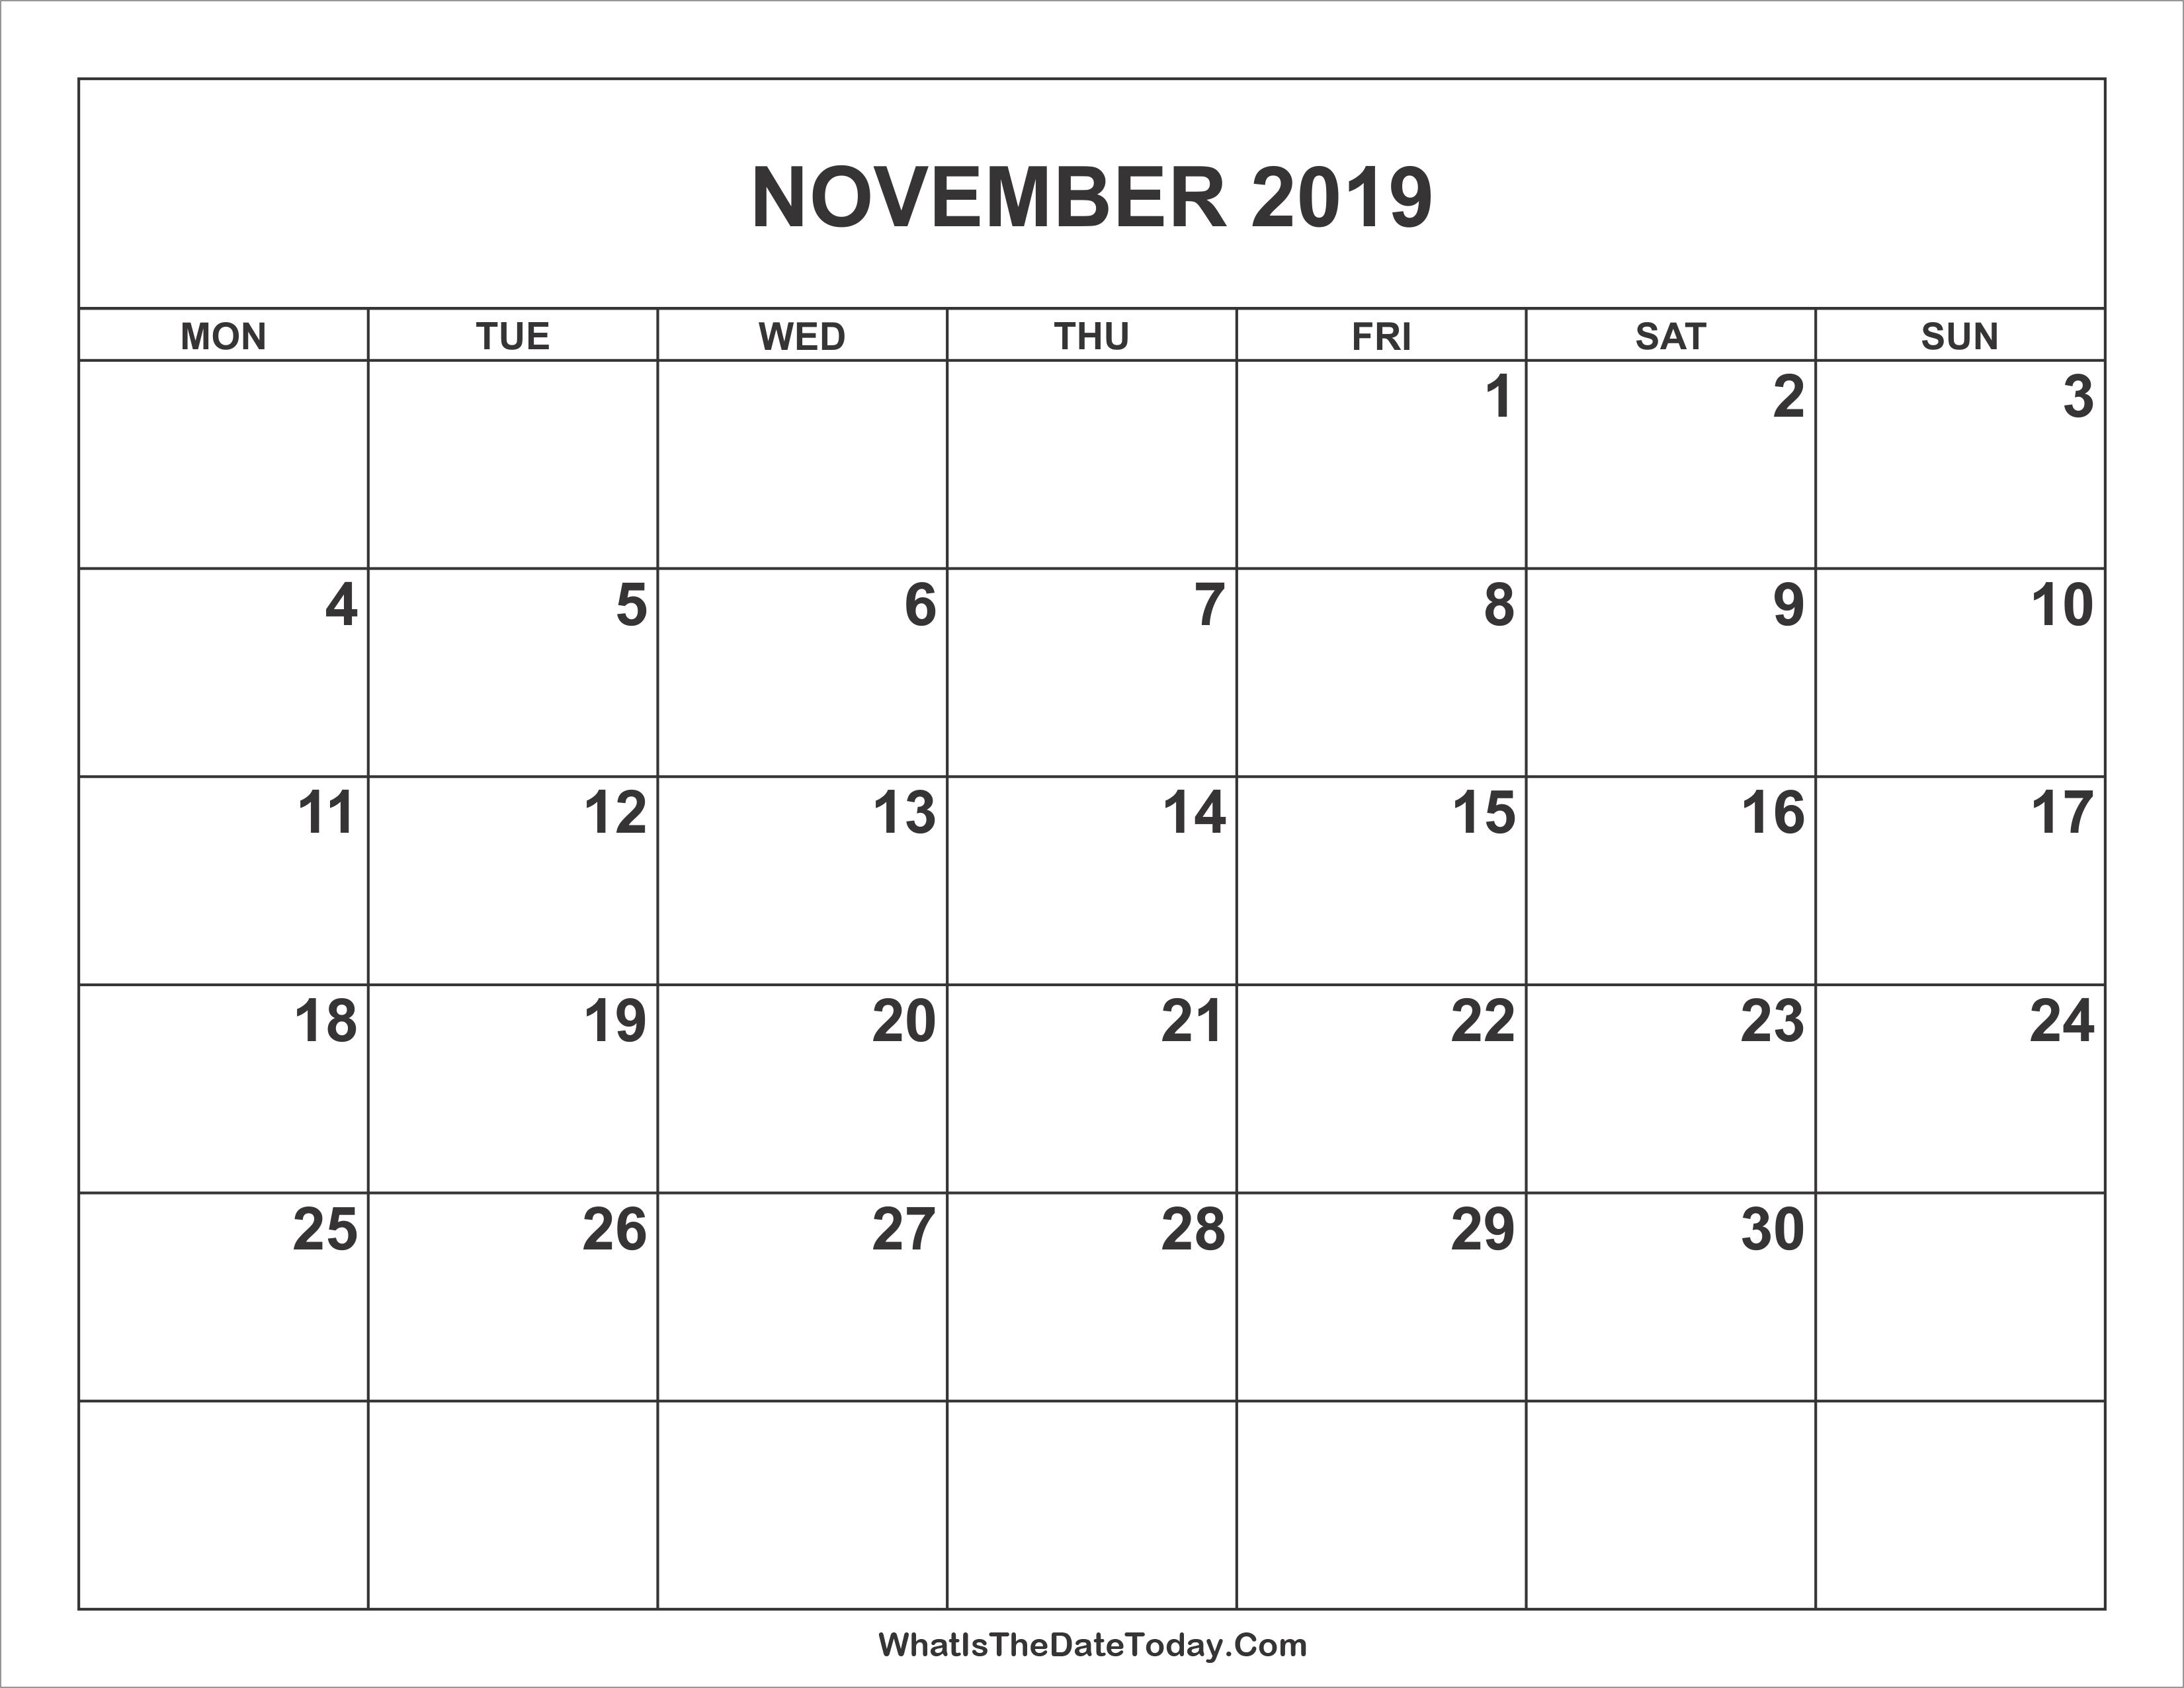 November 2019 Kalender bearbeitbare